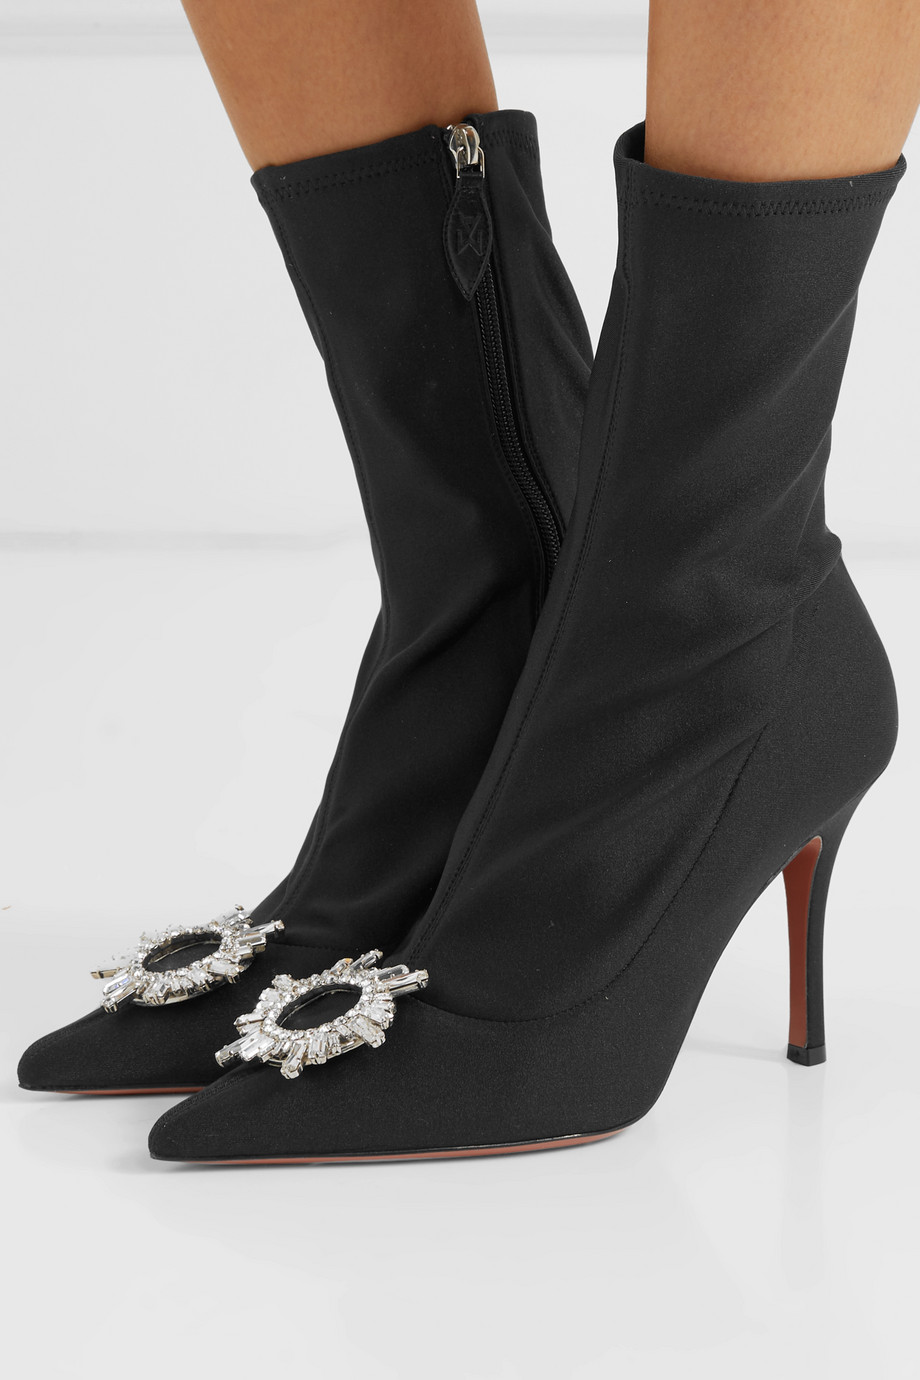 Amina Muaddi Begum crystal-embellished stretch-satin sock boots